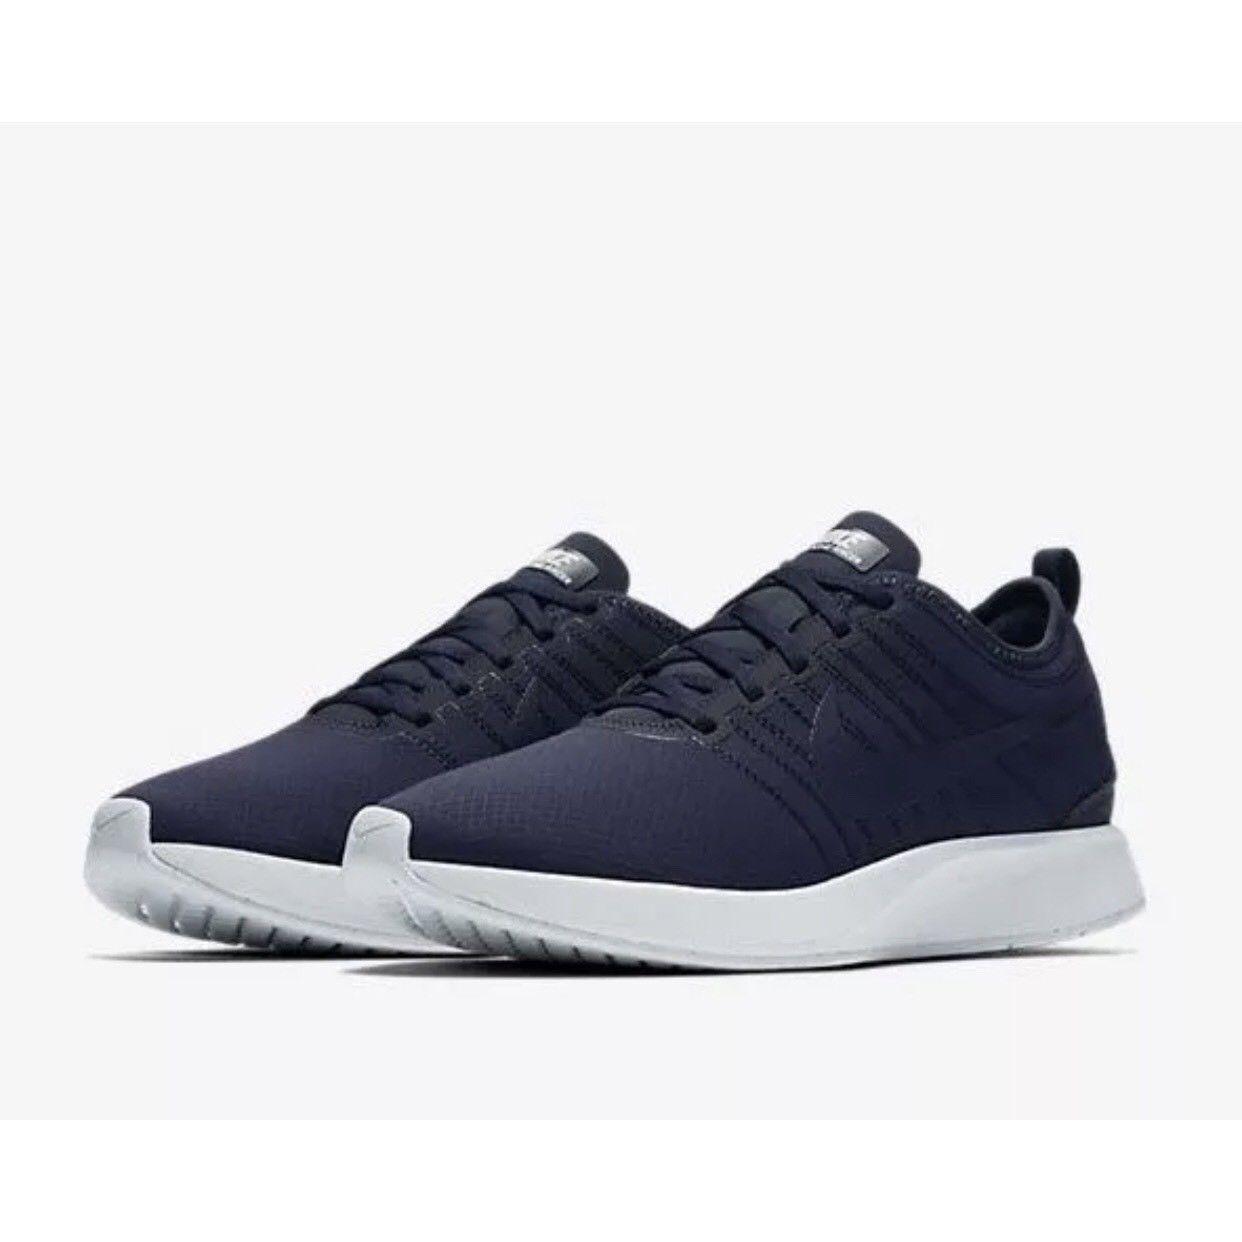 Nike Dualtone Racer Se Men's size 13 athletic Shoes 922170 400 Blue/White Cheap women's shoes women's shoes